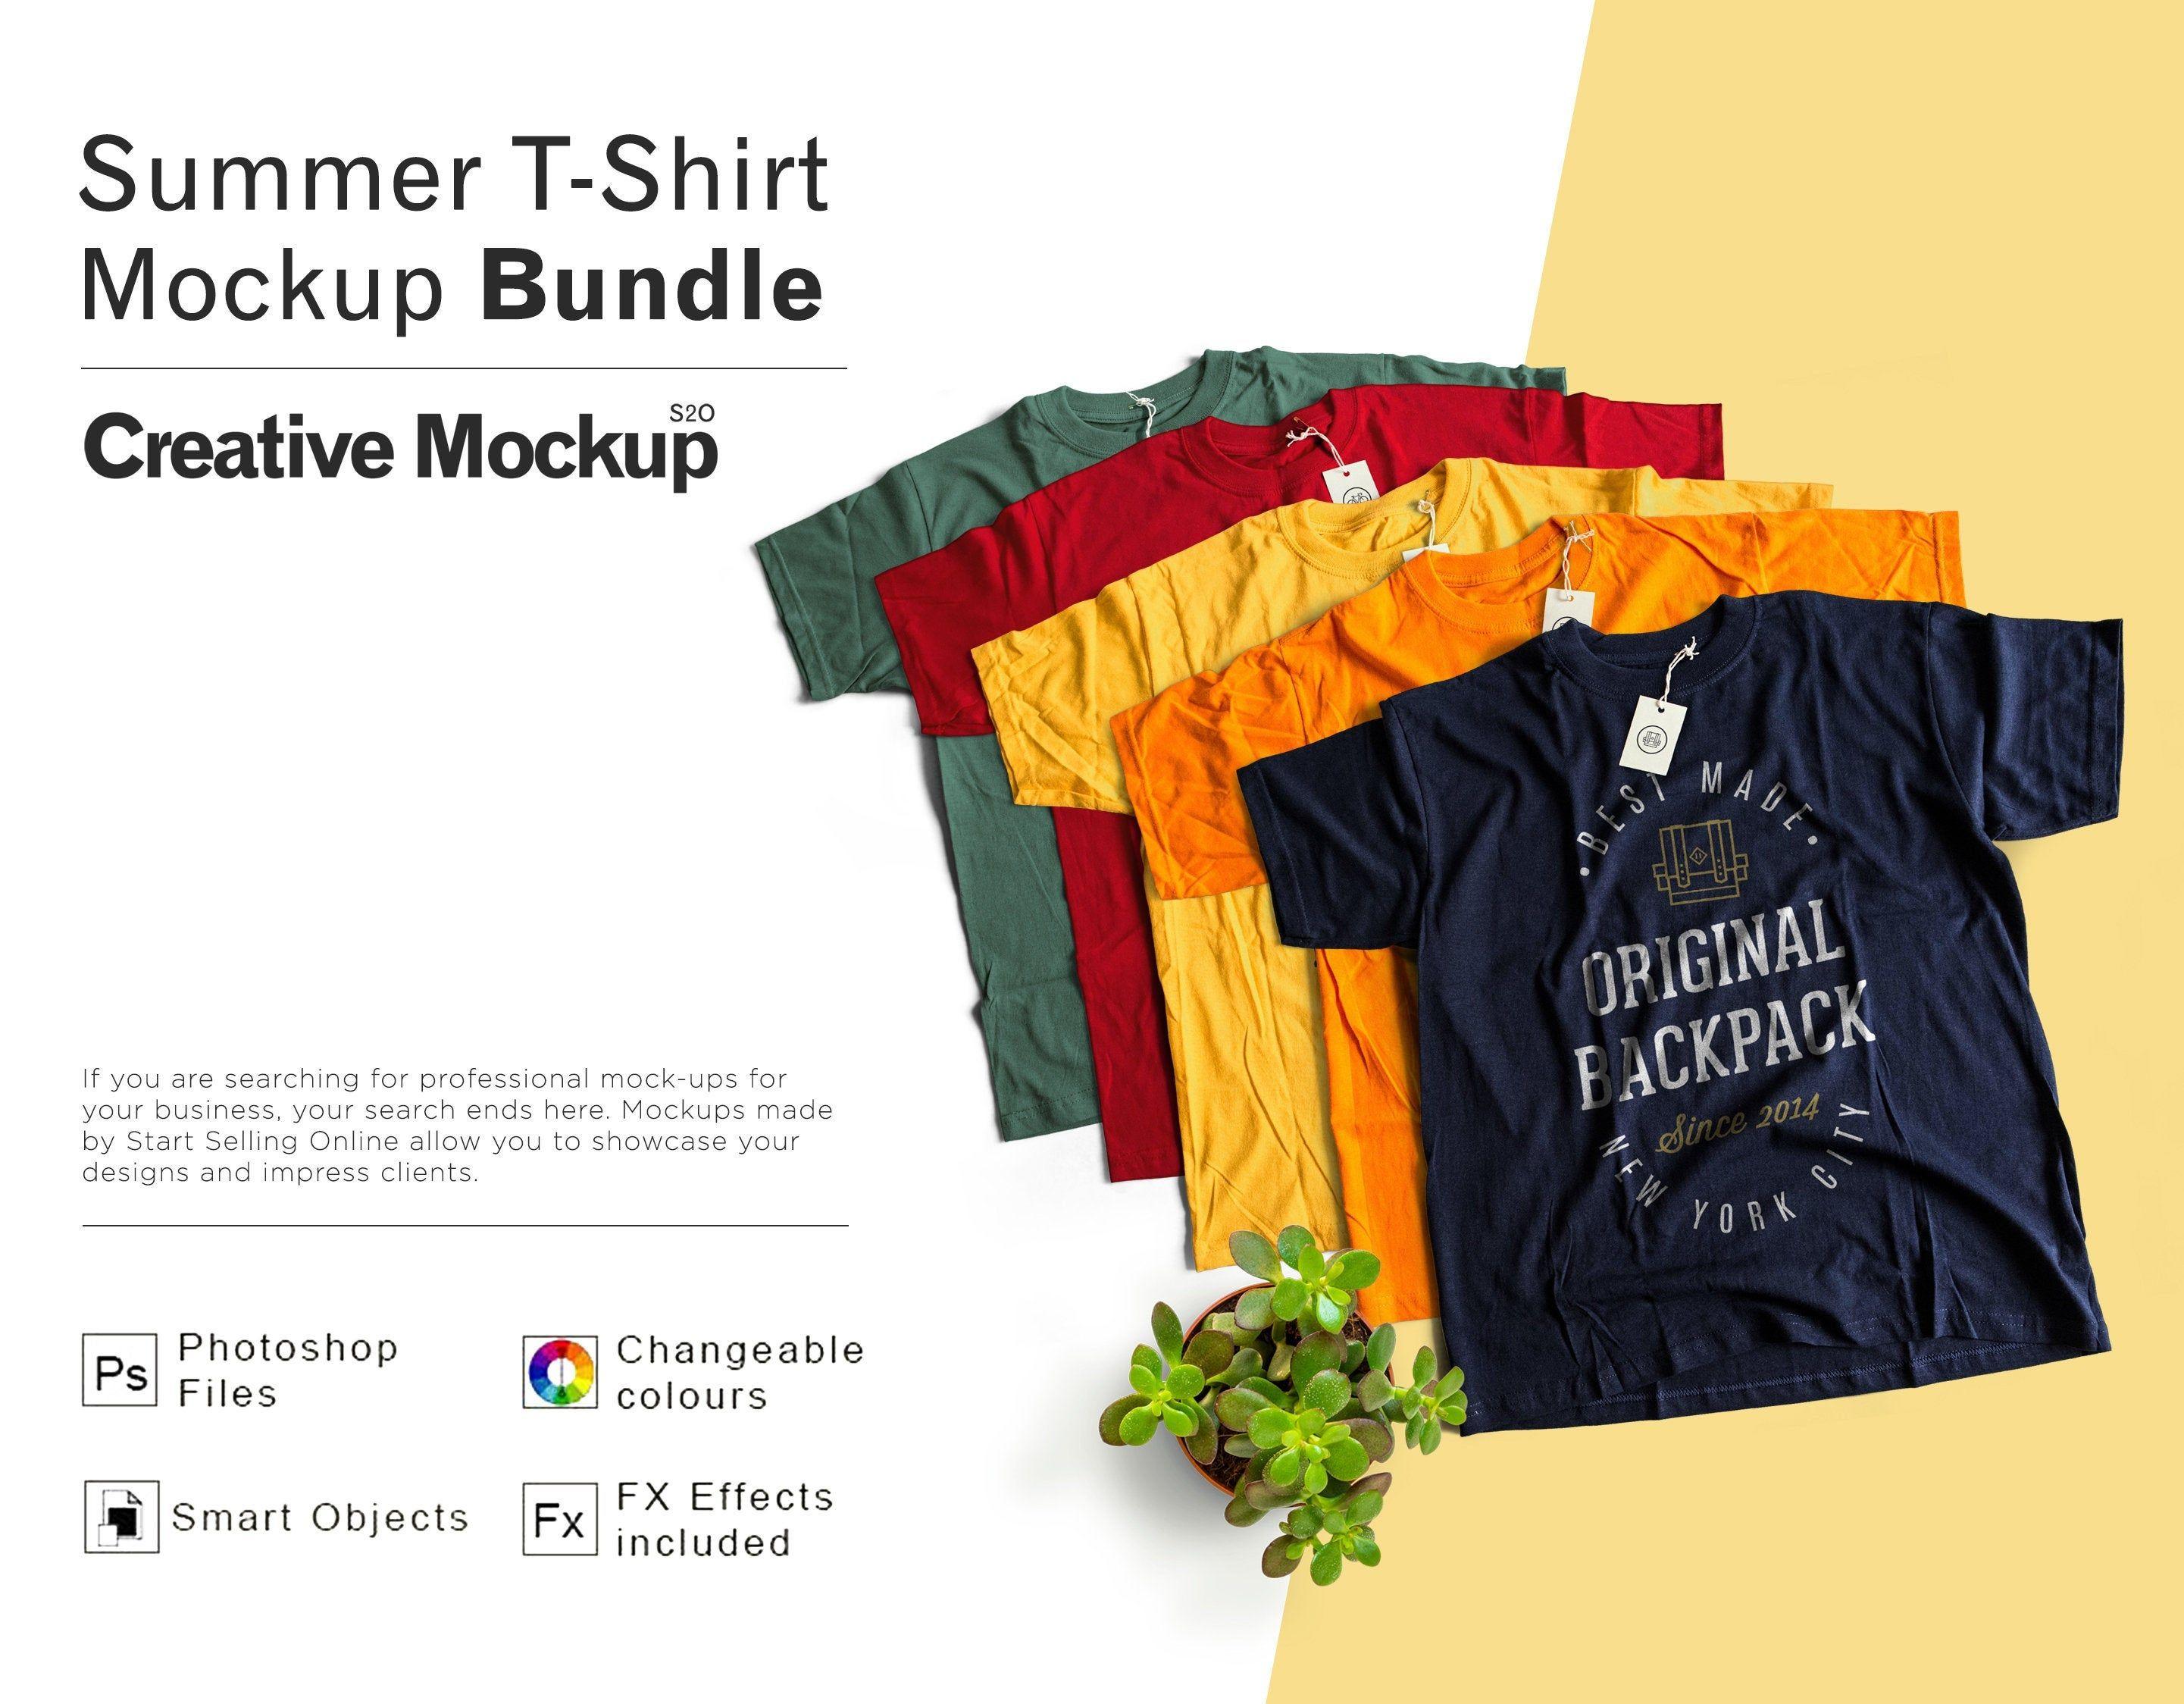 Download T Shirt Mockup Bundle T Shirt 5 Psd Mockup T Shirt Mockup Unisex Shirt Mockup With Label Bellacanvasmockup Bellacanva Shirt Mockup Tshirt Mockup Mockup